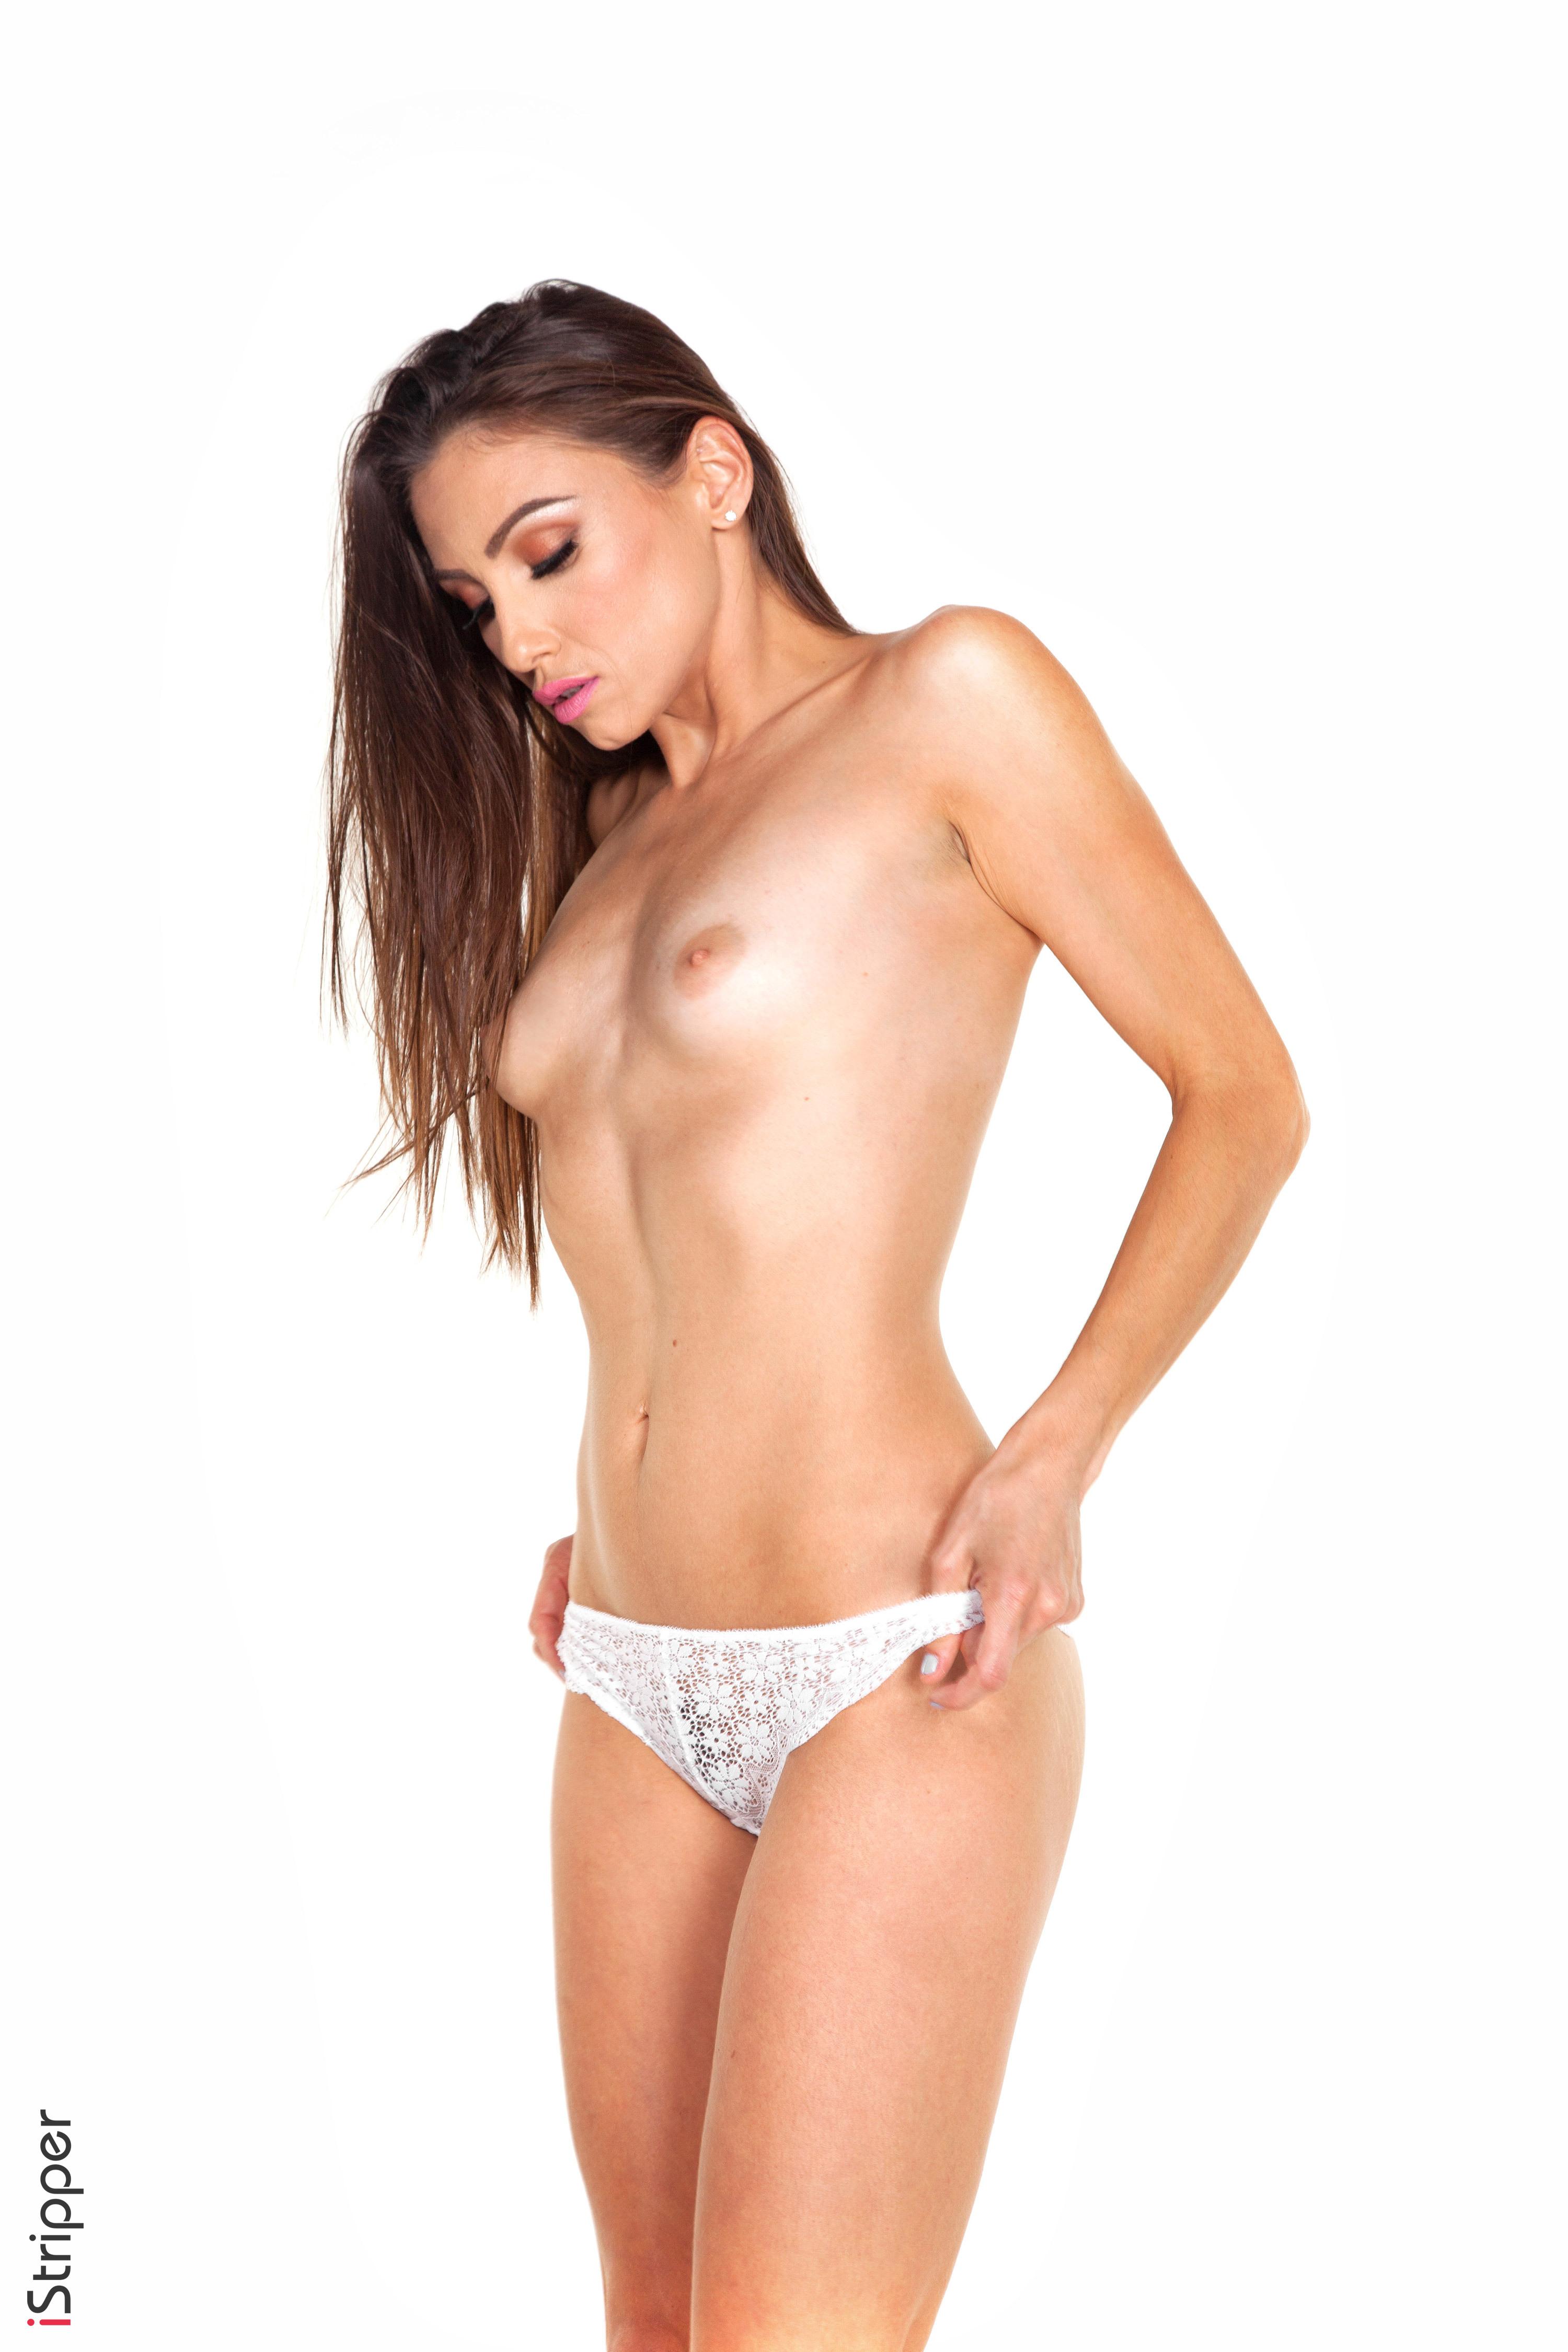 girls in bikini stripping giffs